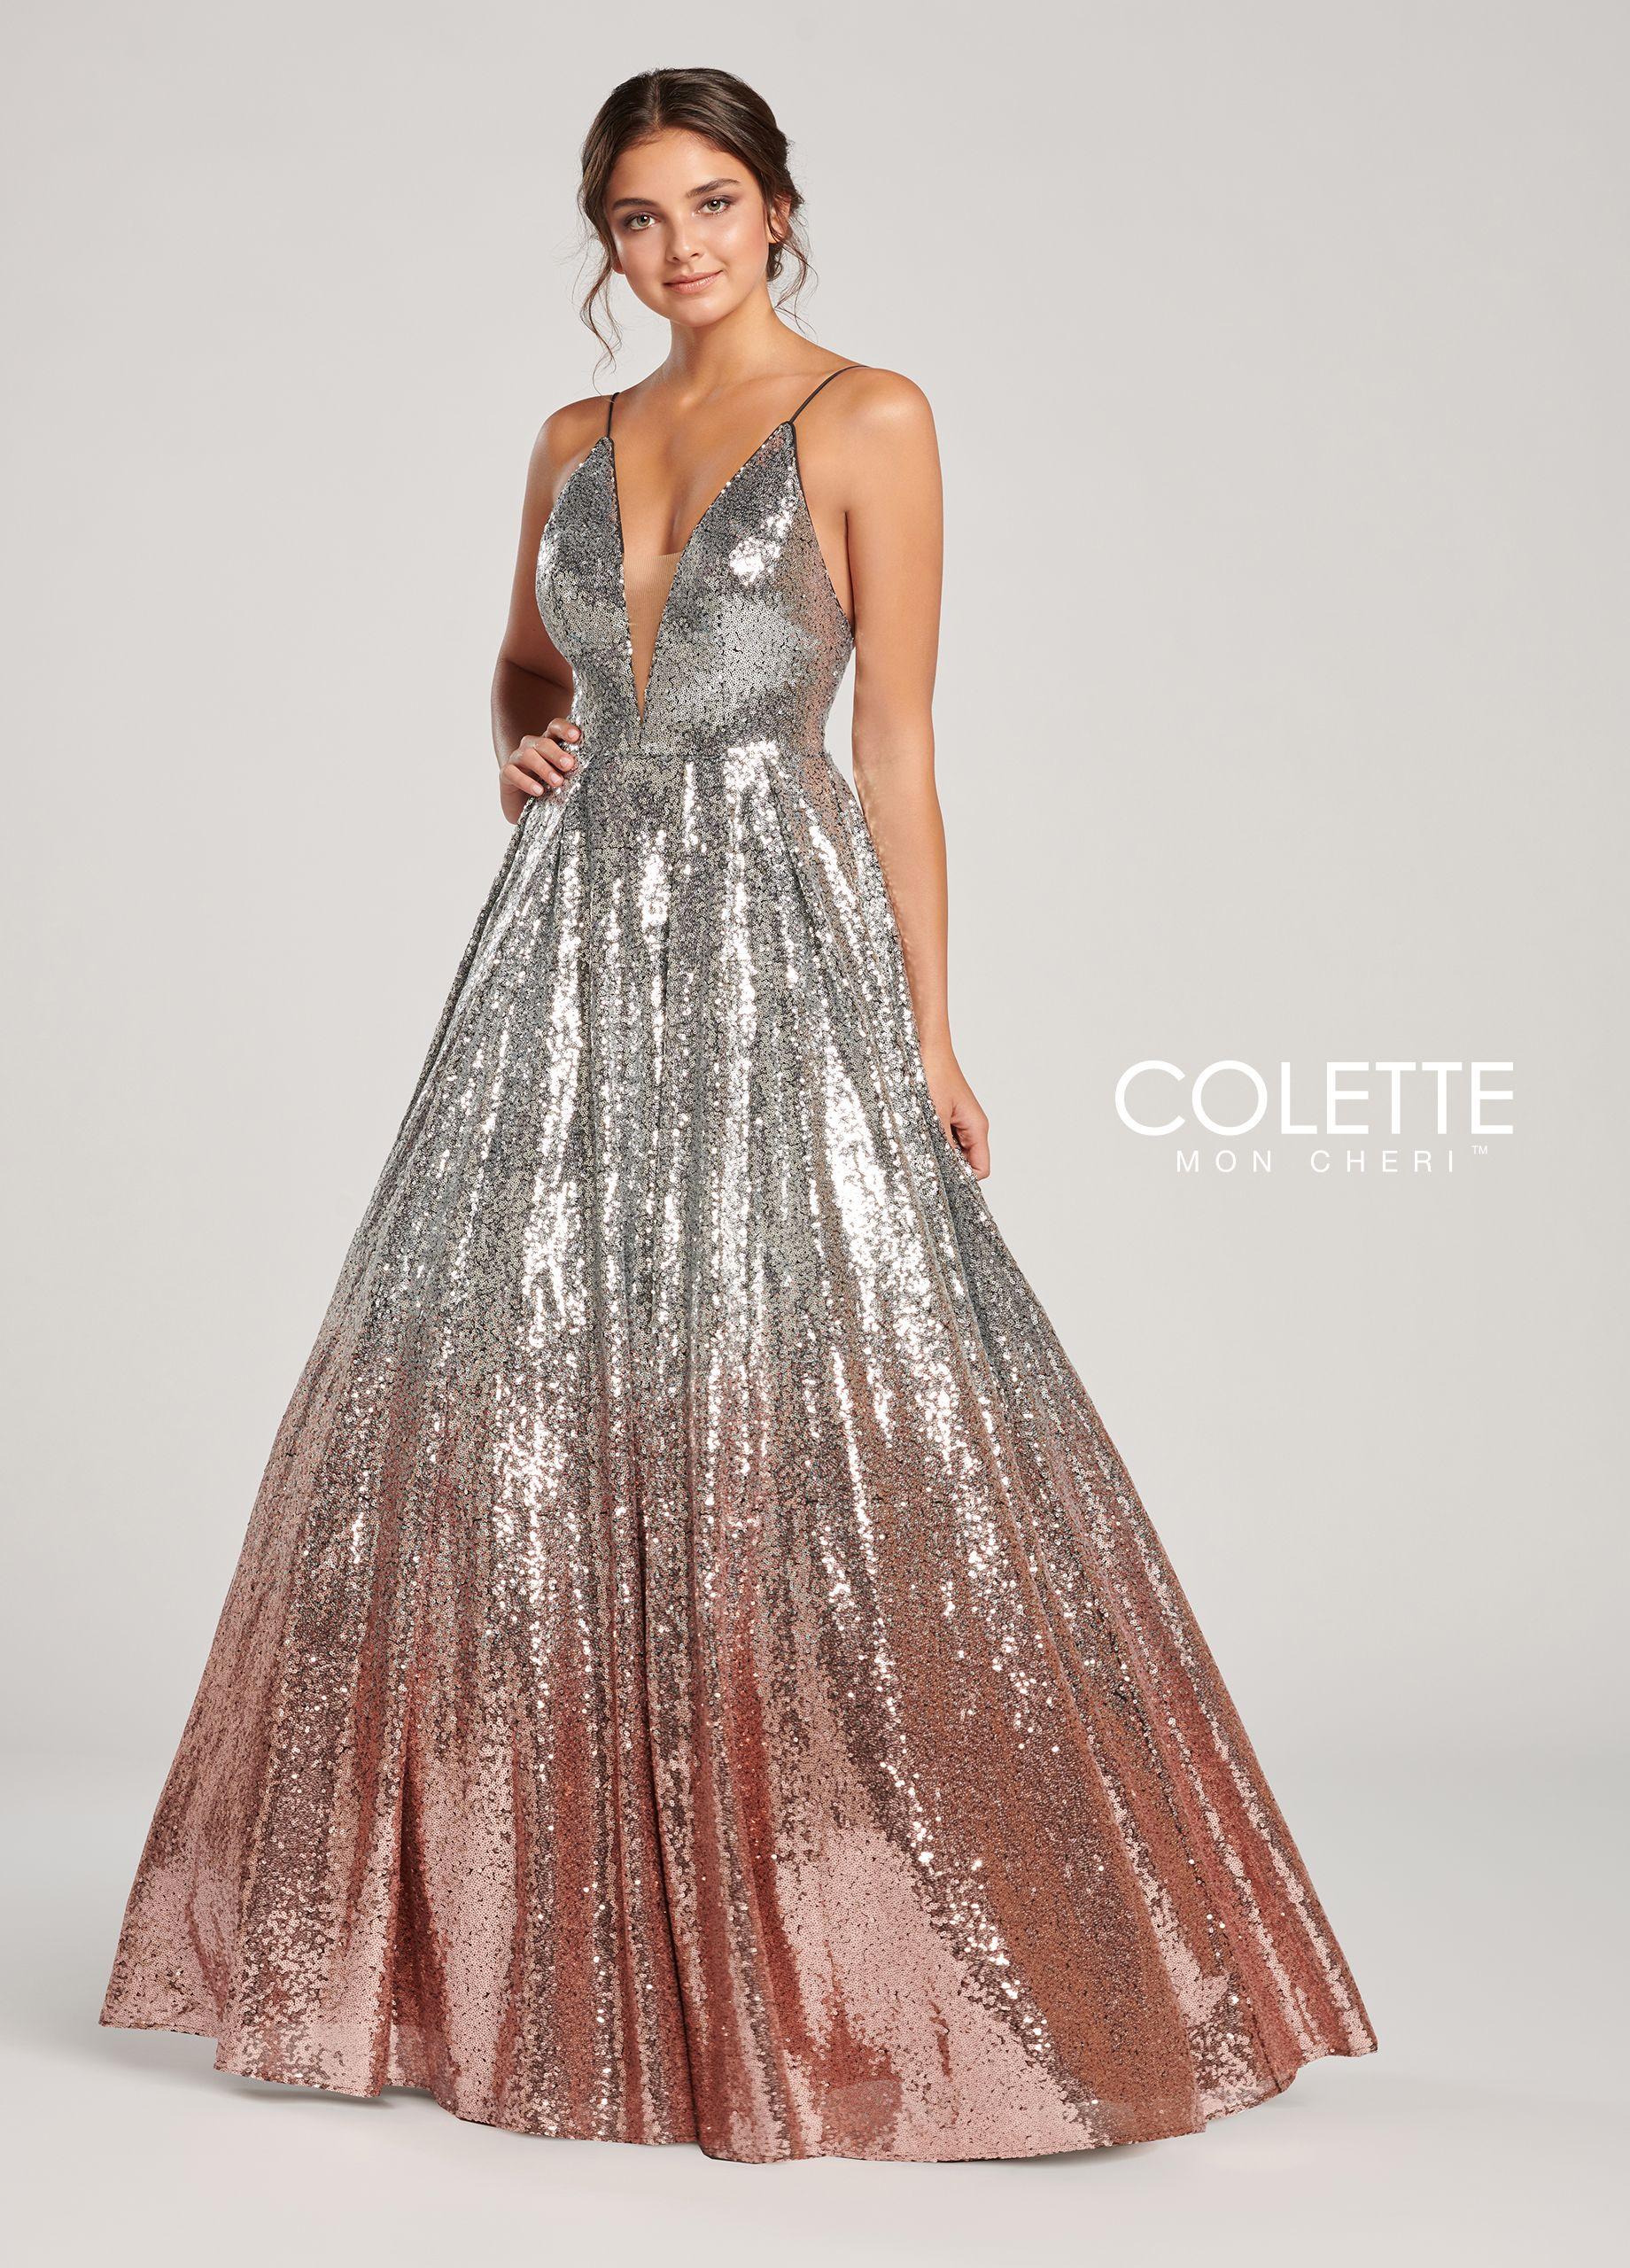 e563acc183b Colette for Mon Cheri CL19872 - Strapless sequin ballgown with a plunging  illusion v-neck